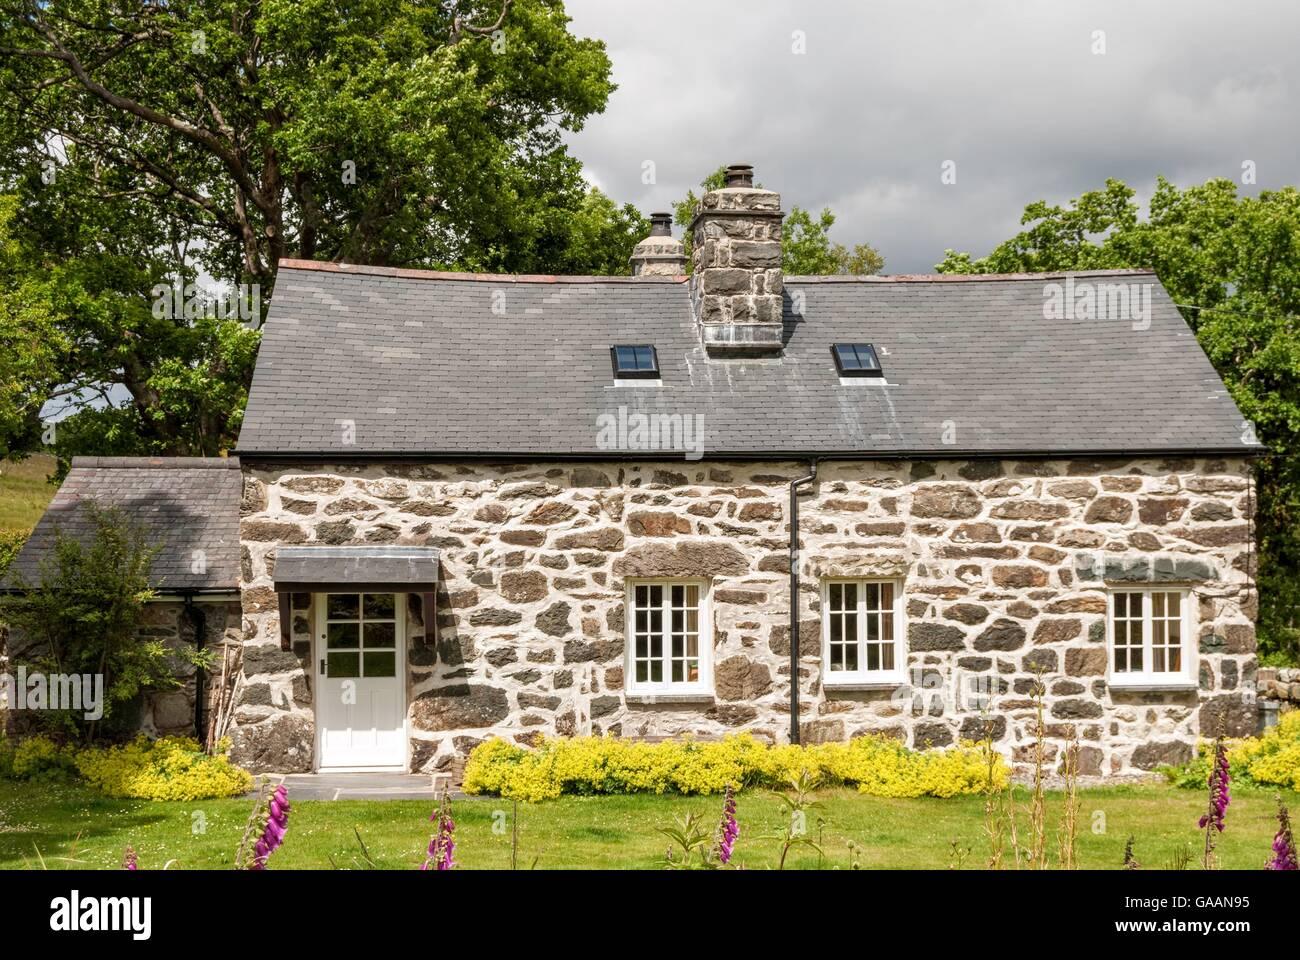 Welsh Cottage - Stock Image